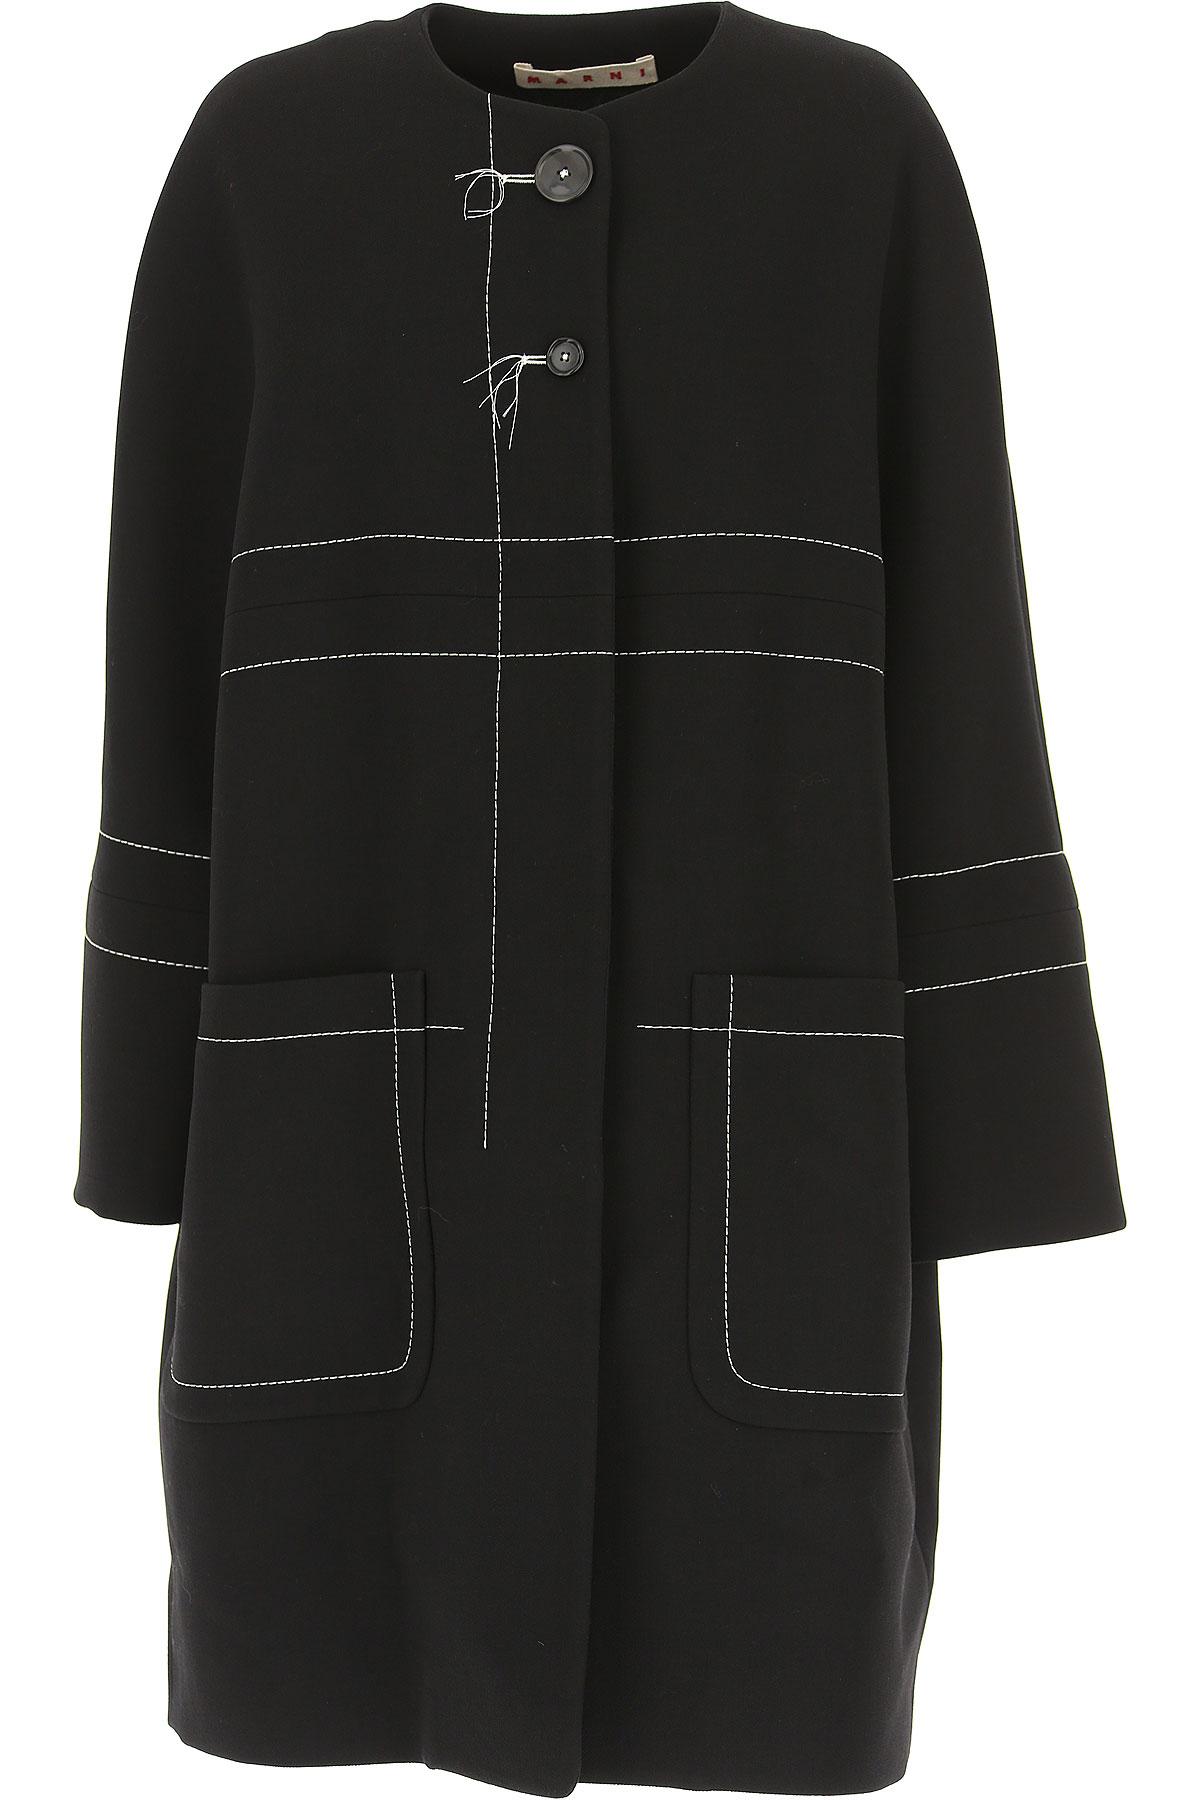 Image of Marni Women\'s Coat, Black, Virgin wool, 2017, 4 6 8